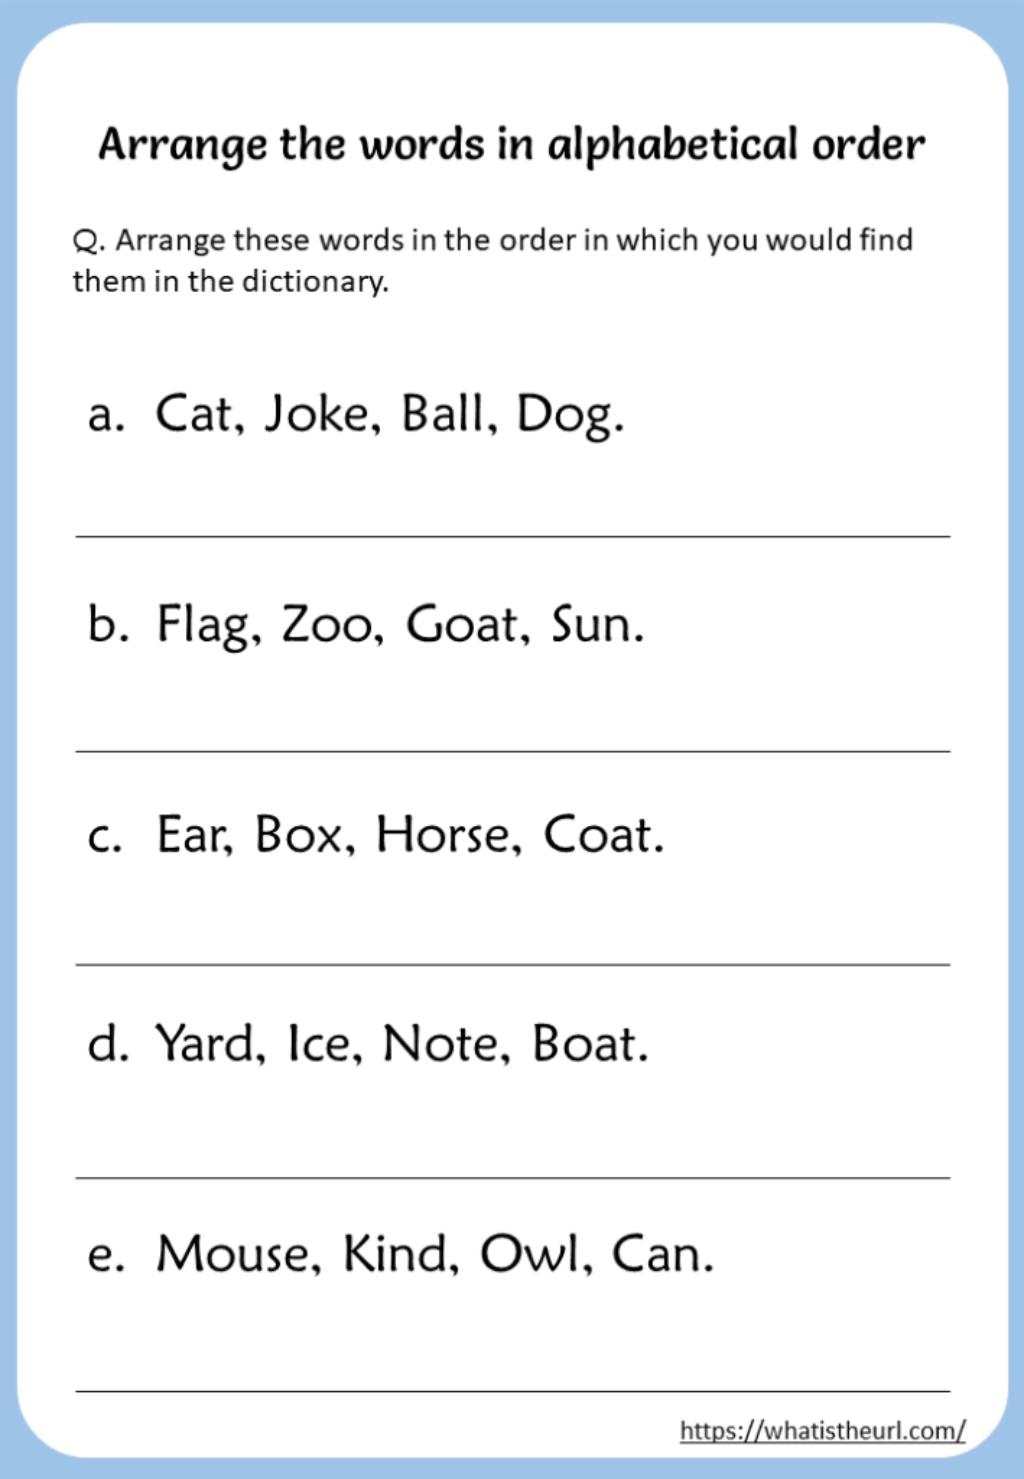 Arrange-The-Words-In-Alphabetical-Order-Worksheet - Your pertaining to Alphabet Order Worksheets